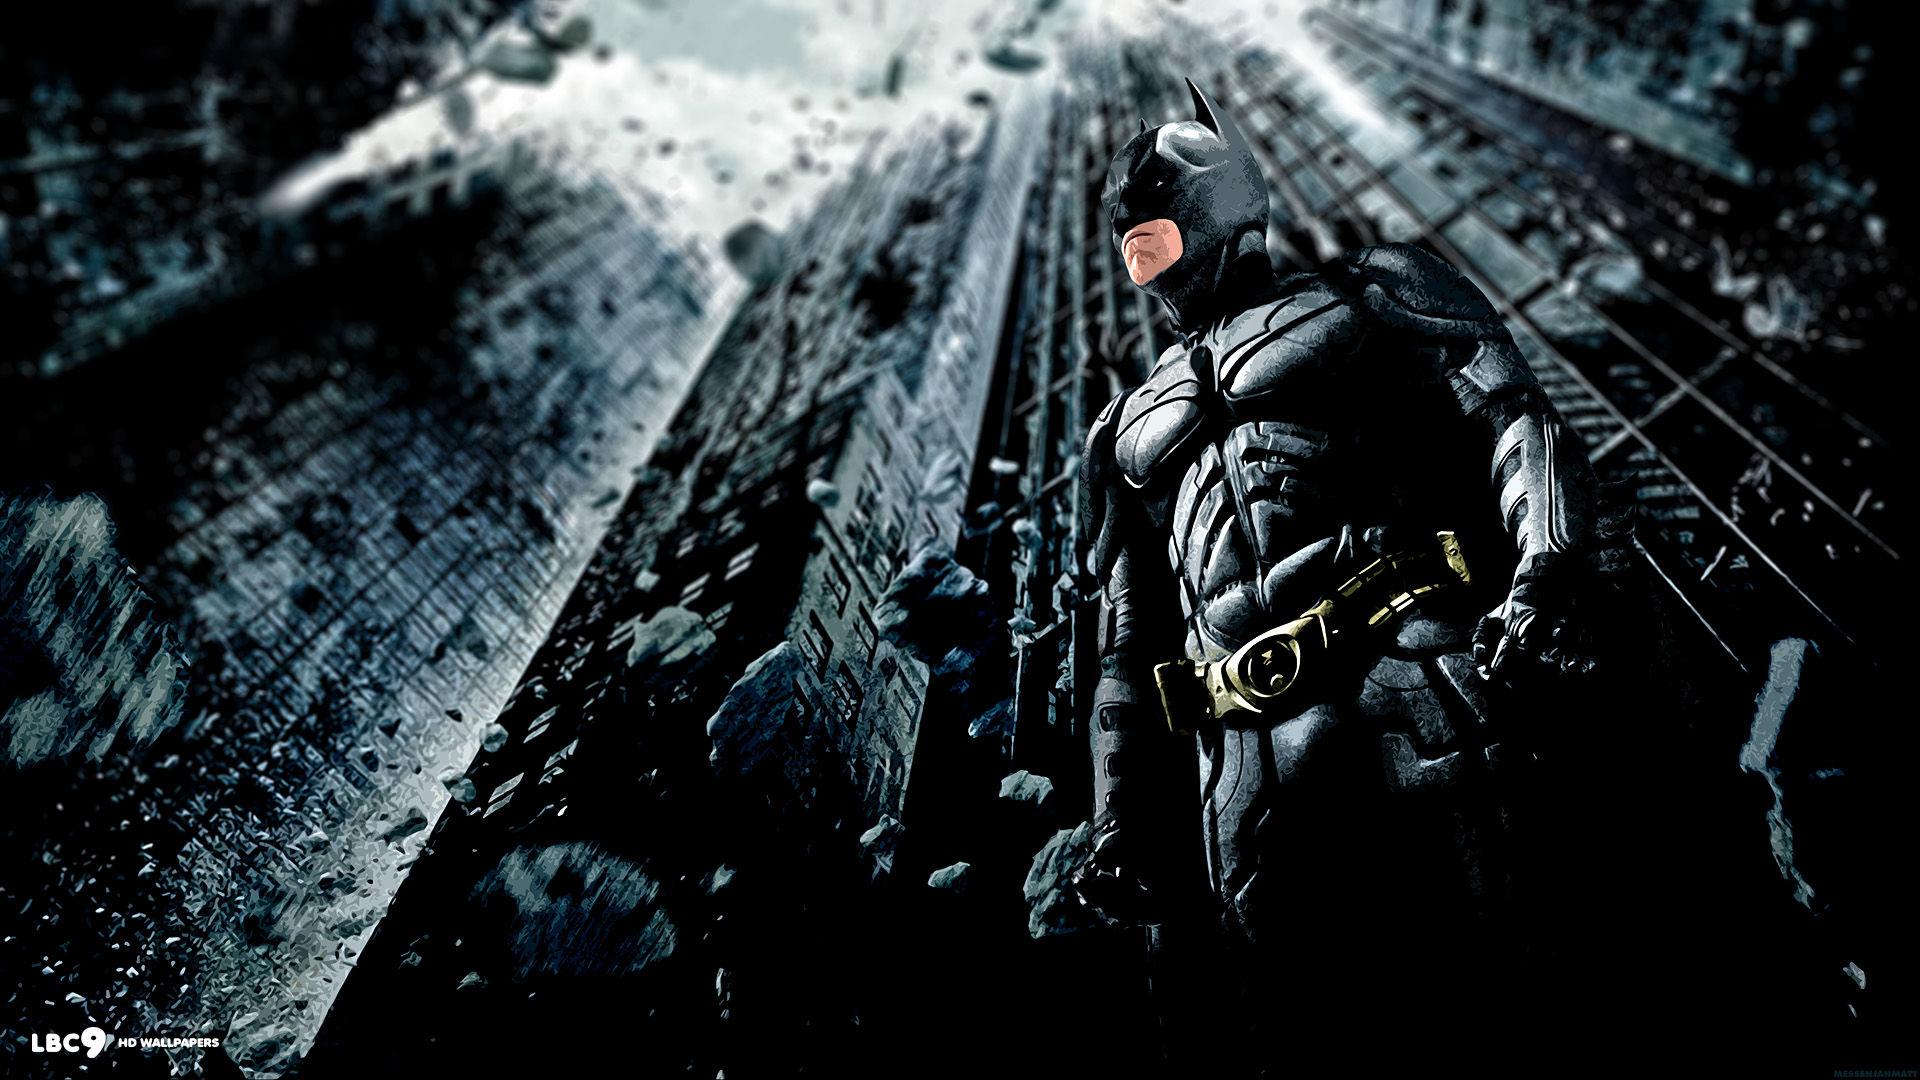 Dark Knight Hd Wallpapers Posted By John Walker